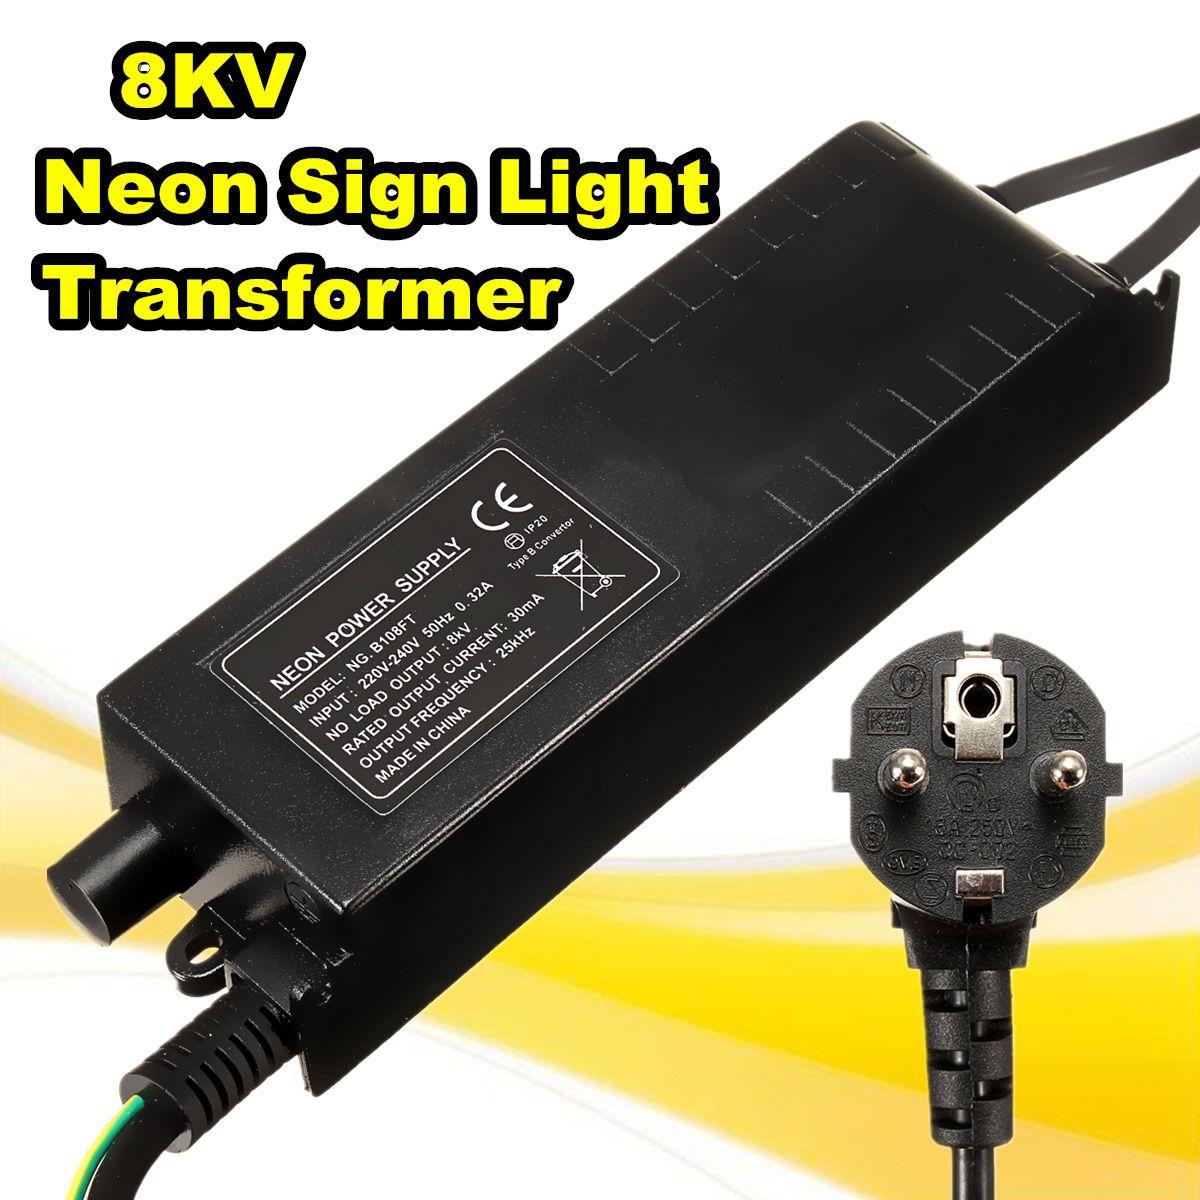 8KV 220V 30mA Neon Sign Transformer Power Supply + Dimmer Neon Adjust Ballast